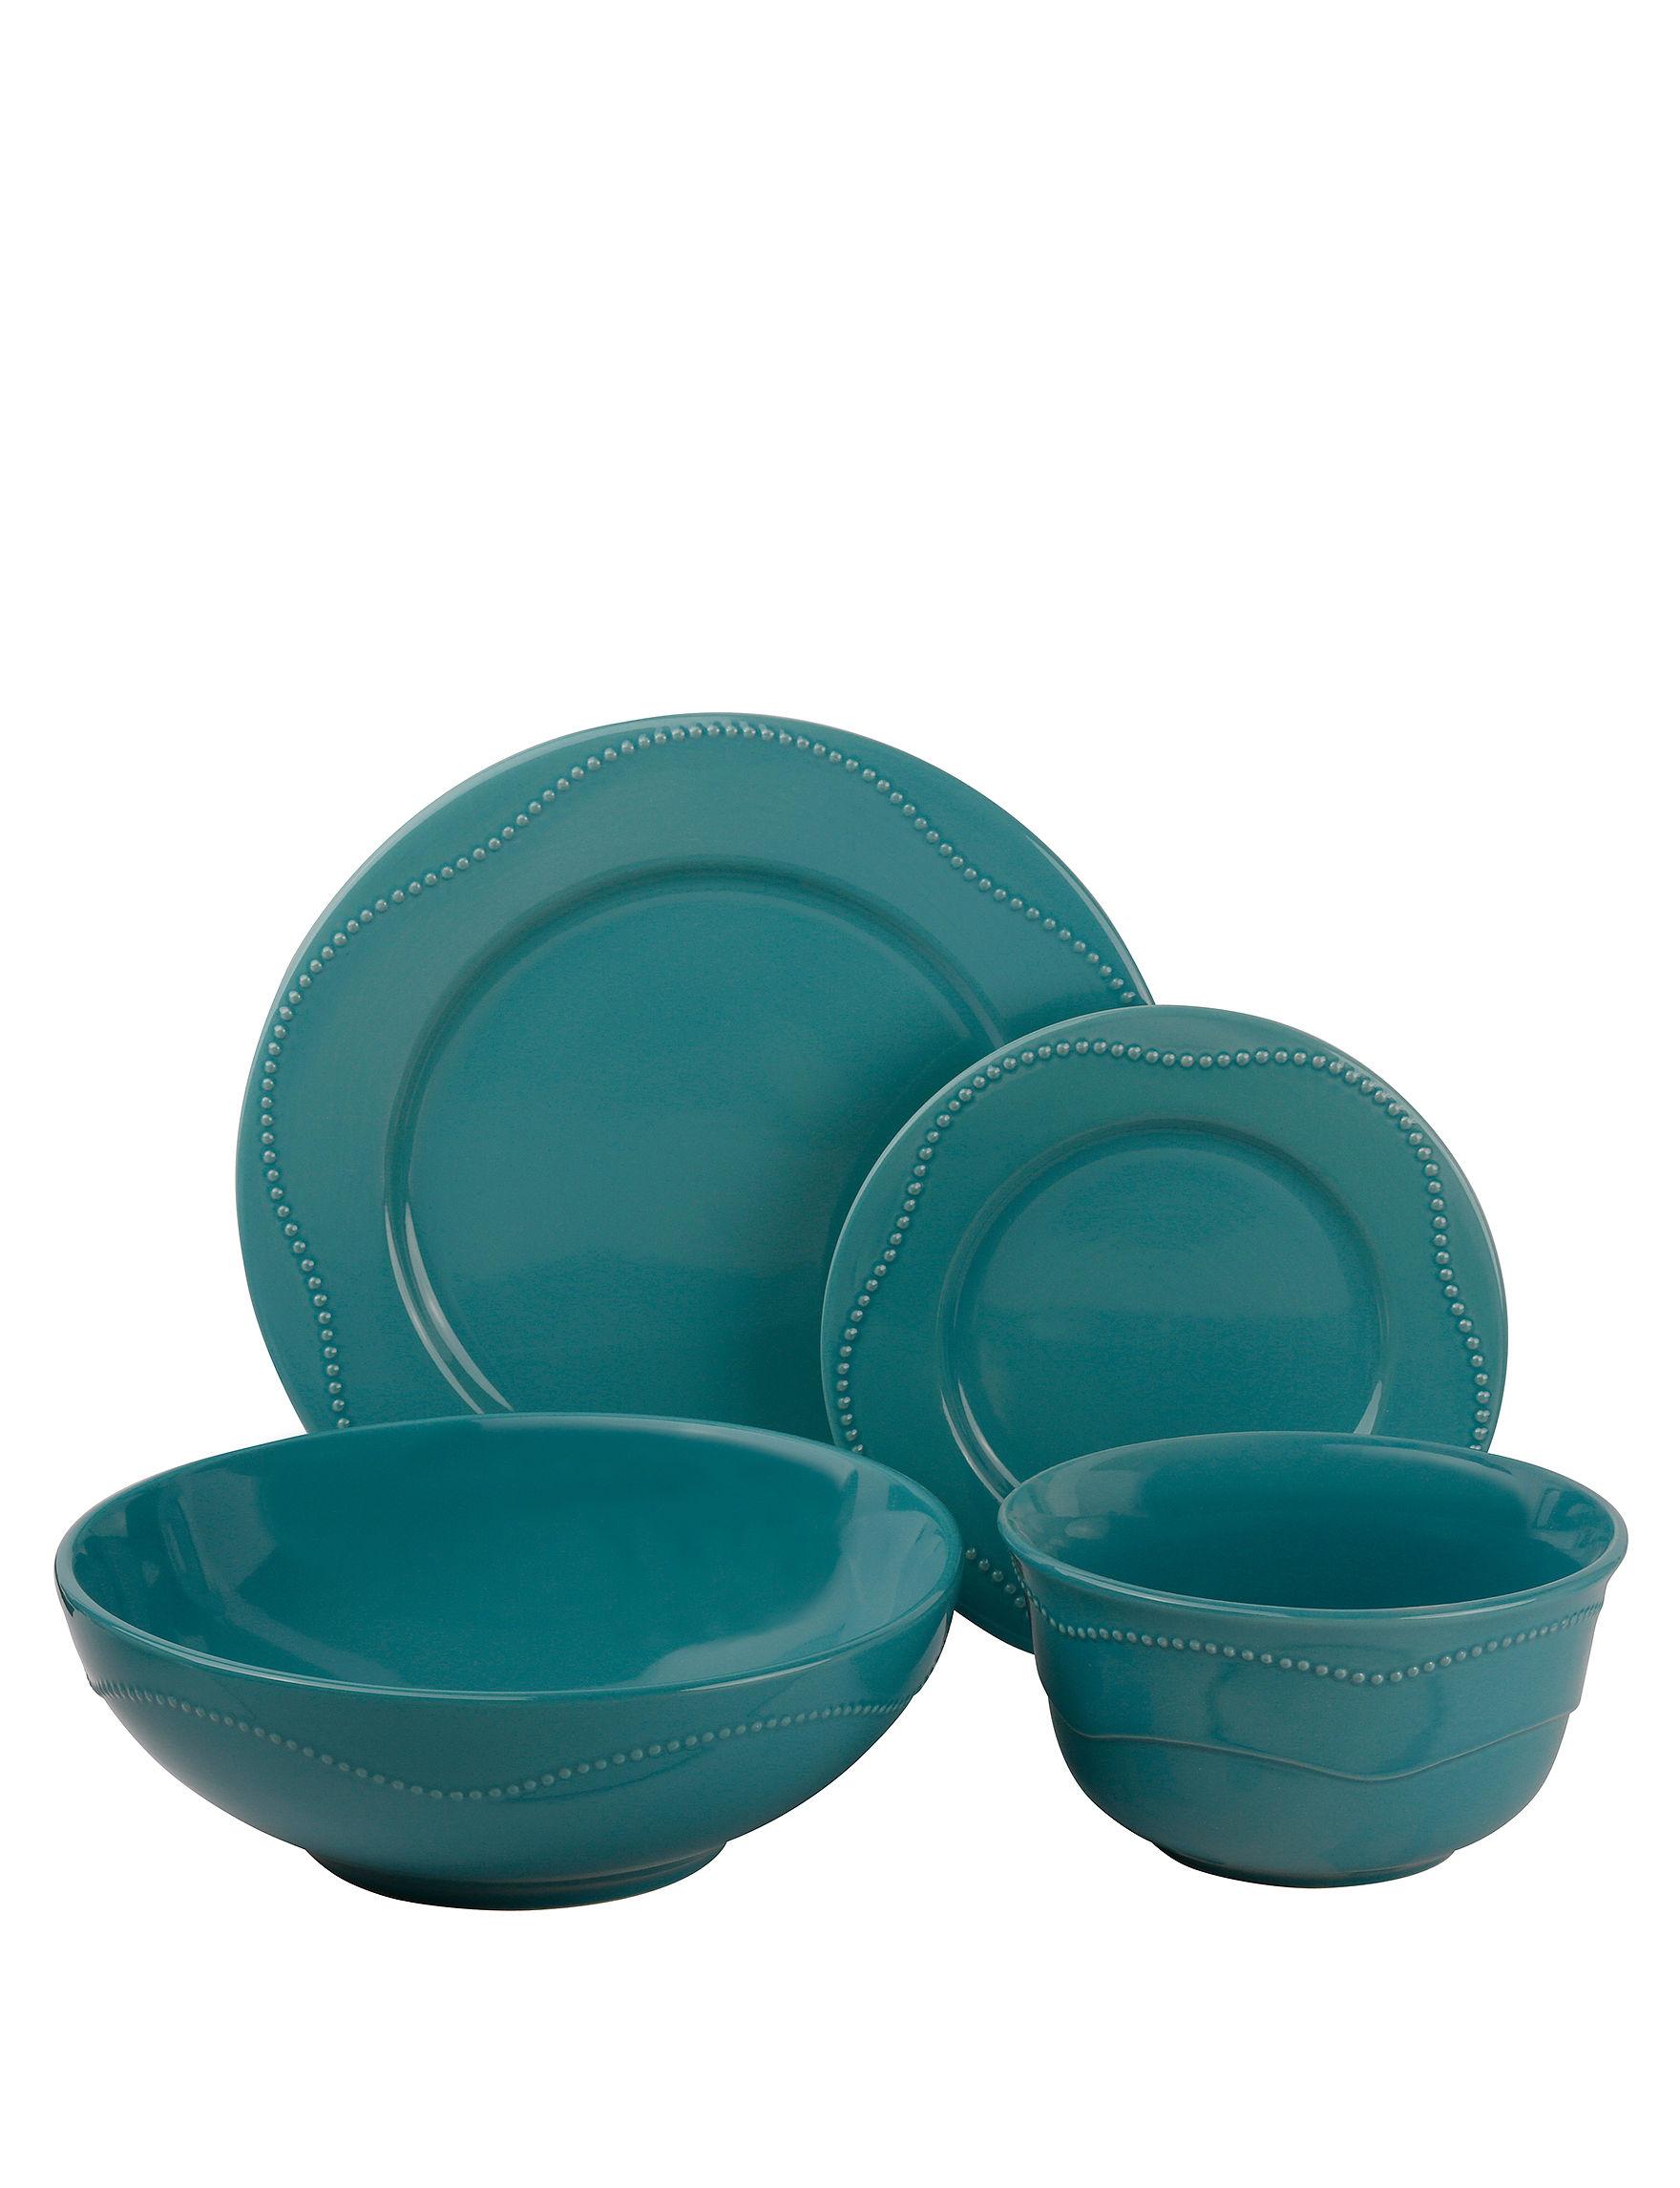 10 Strawberry Street Teal Dinnerware Sets Dinnerware